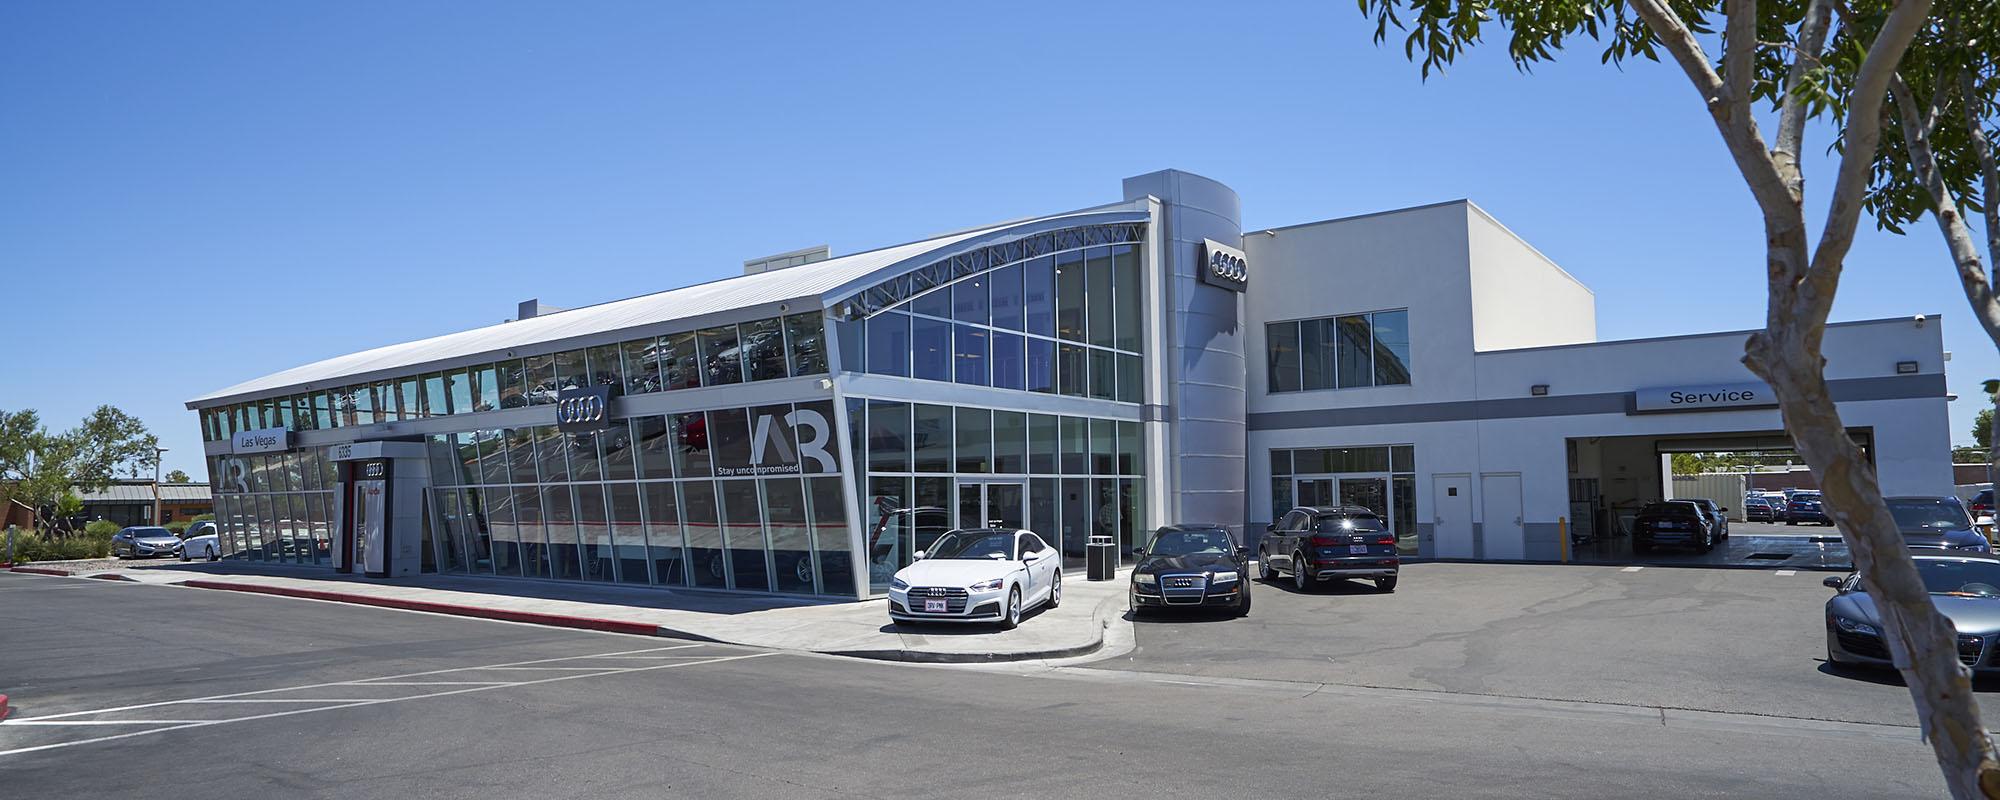 Audi Las Vegas Audi Dealership In Las Vegas NV - Audi dealers near me